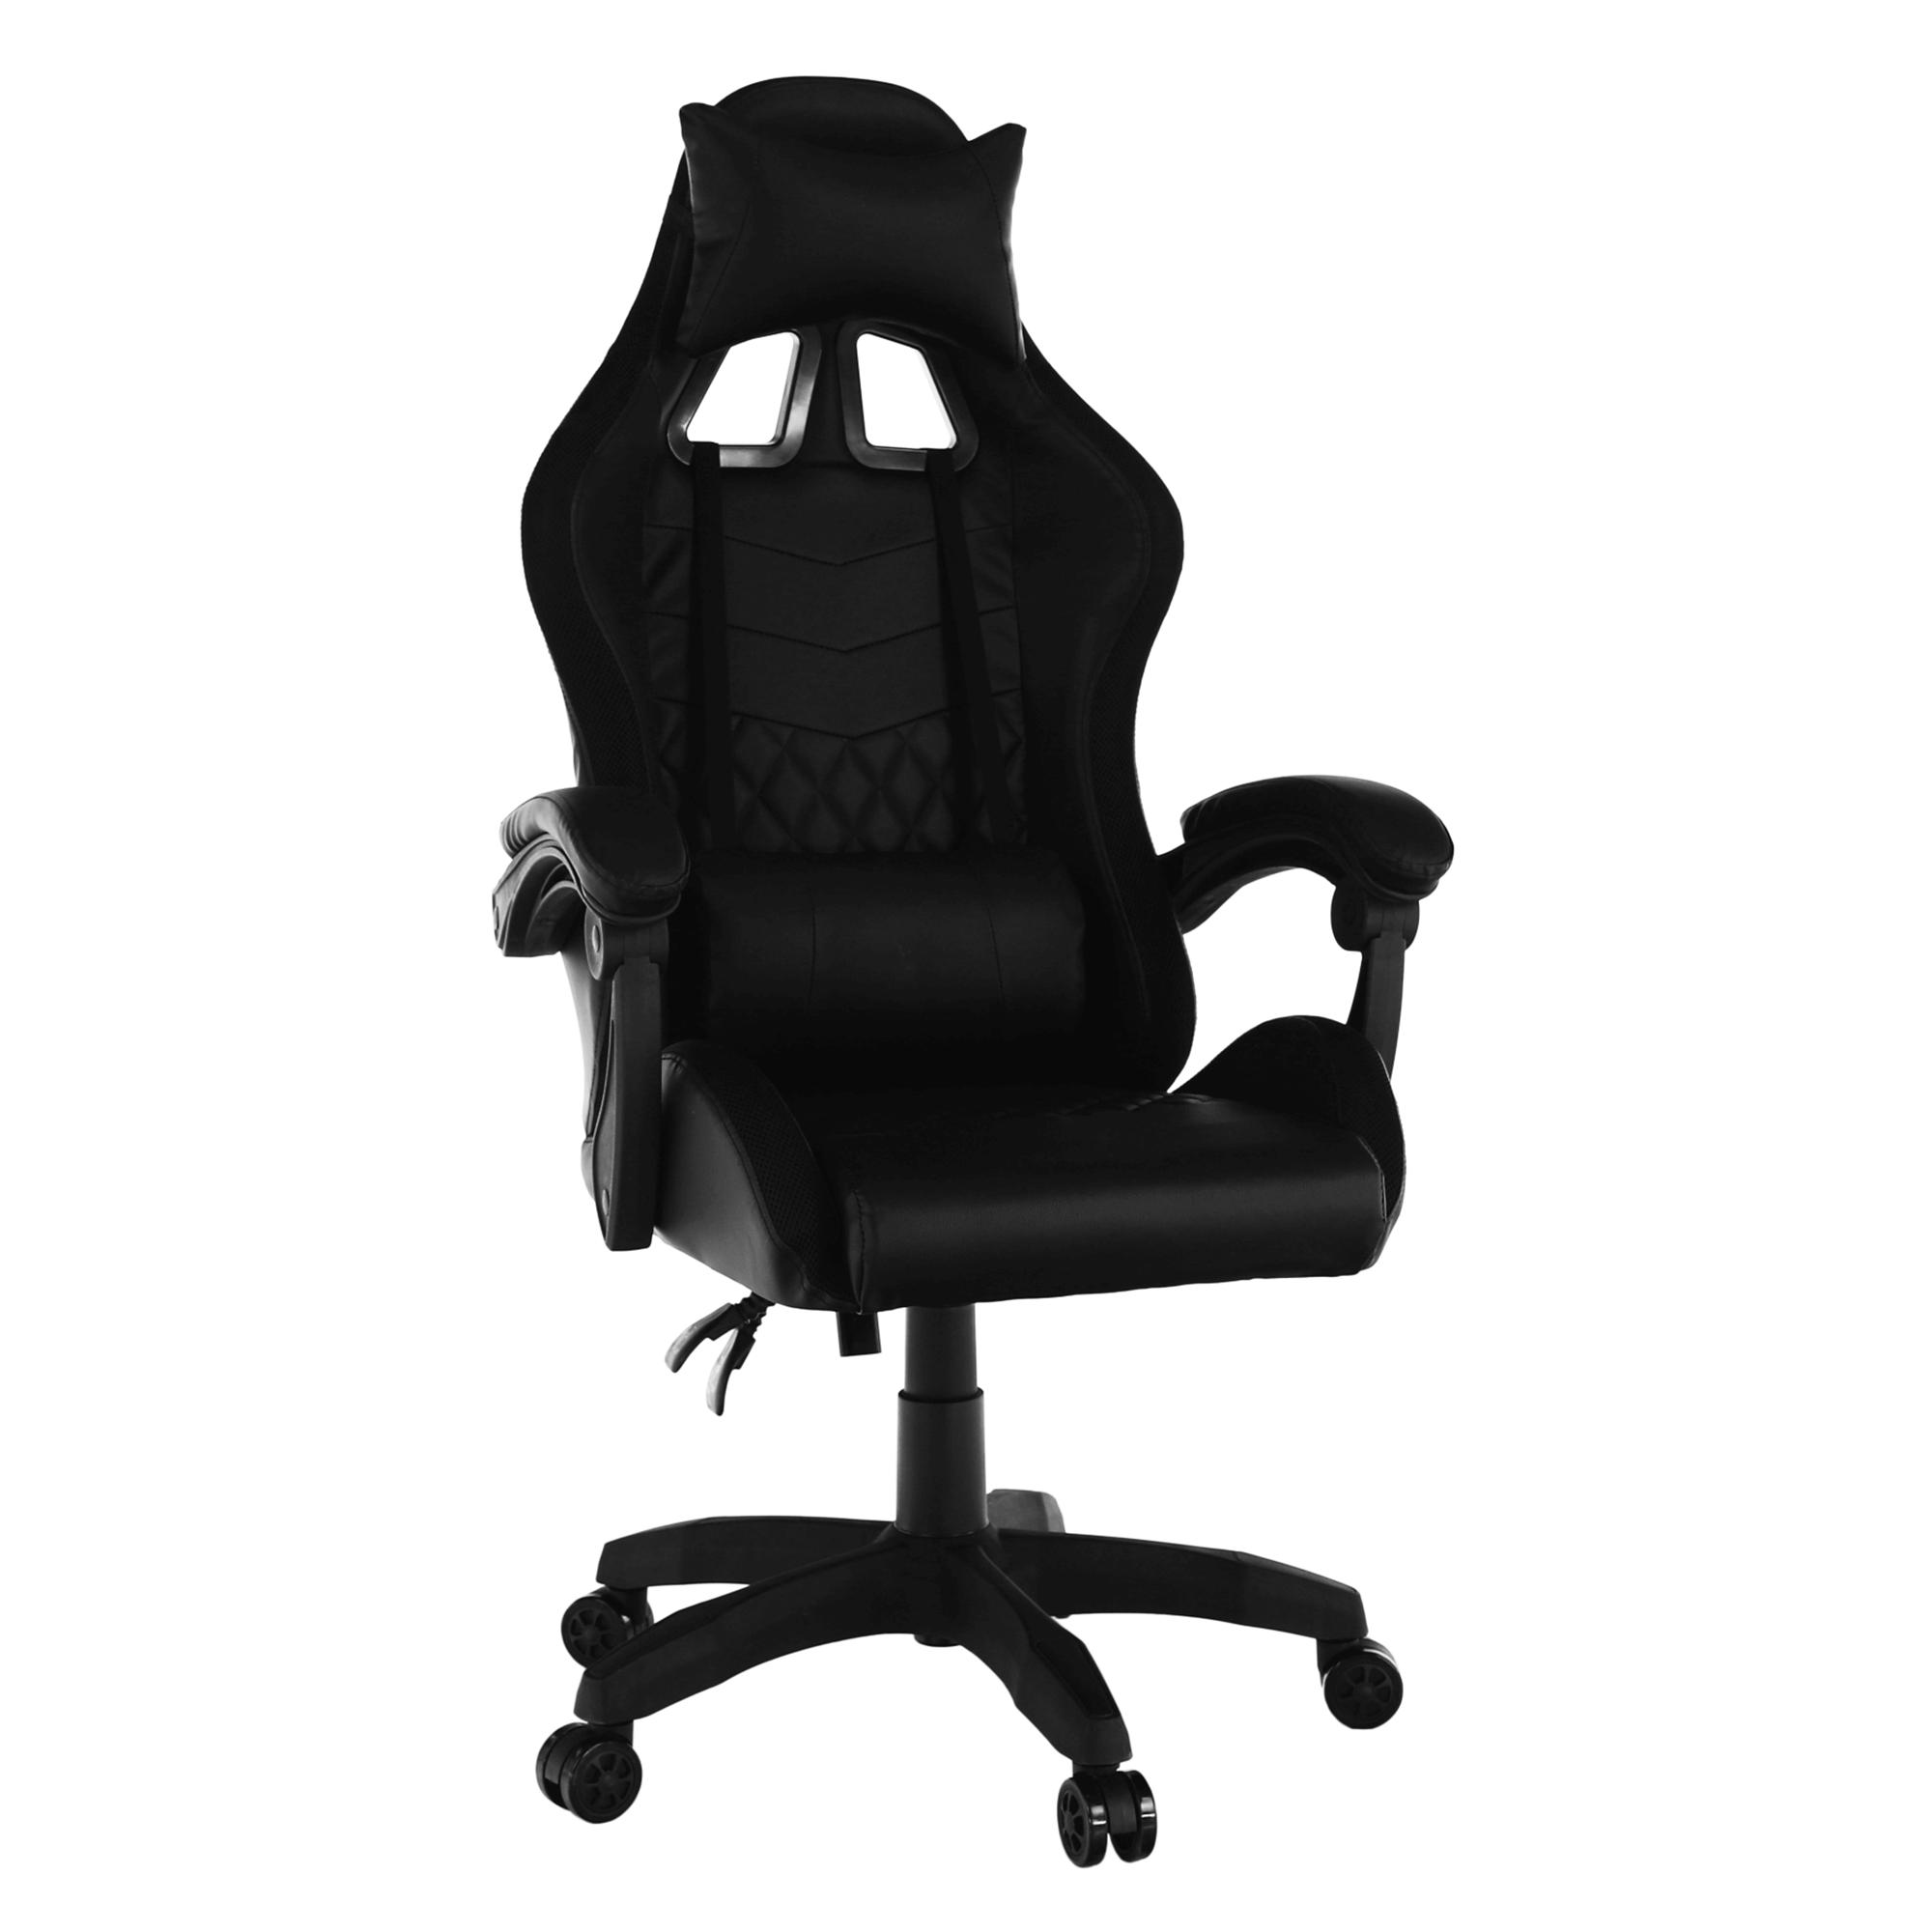 Scaun de birou / joc cu iluminare LED RGB, negru, MAFIRO